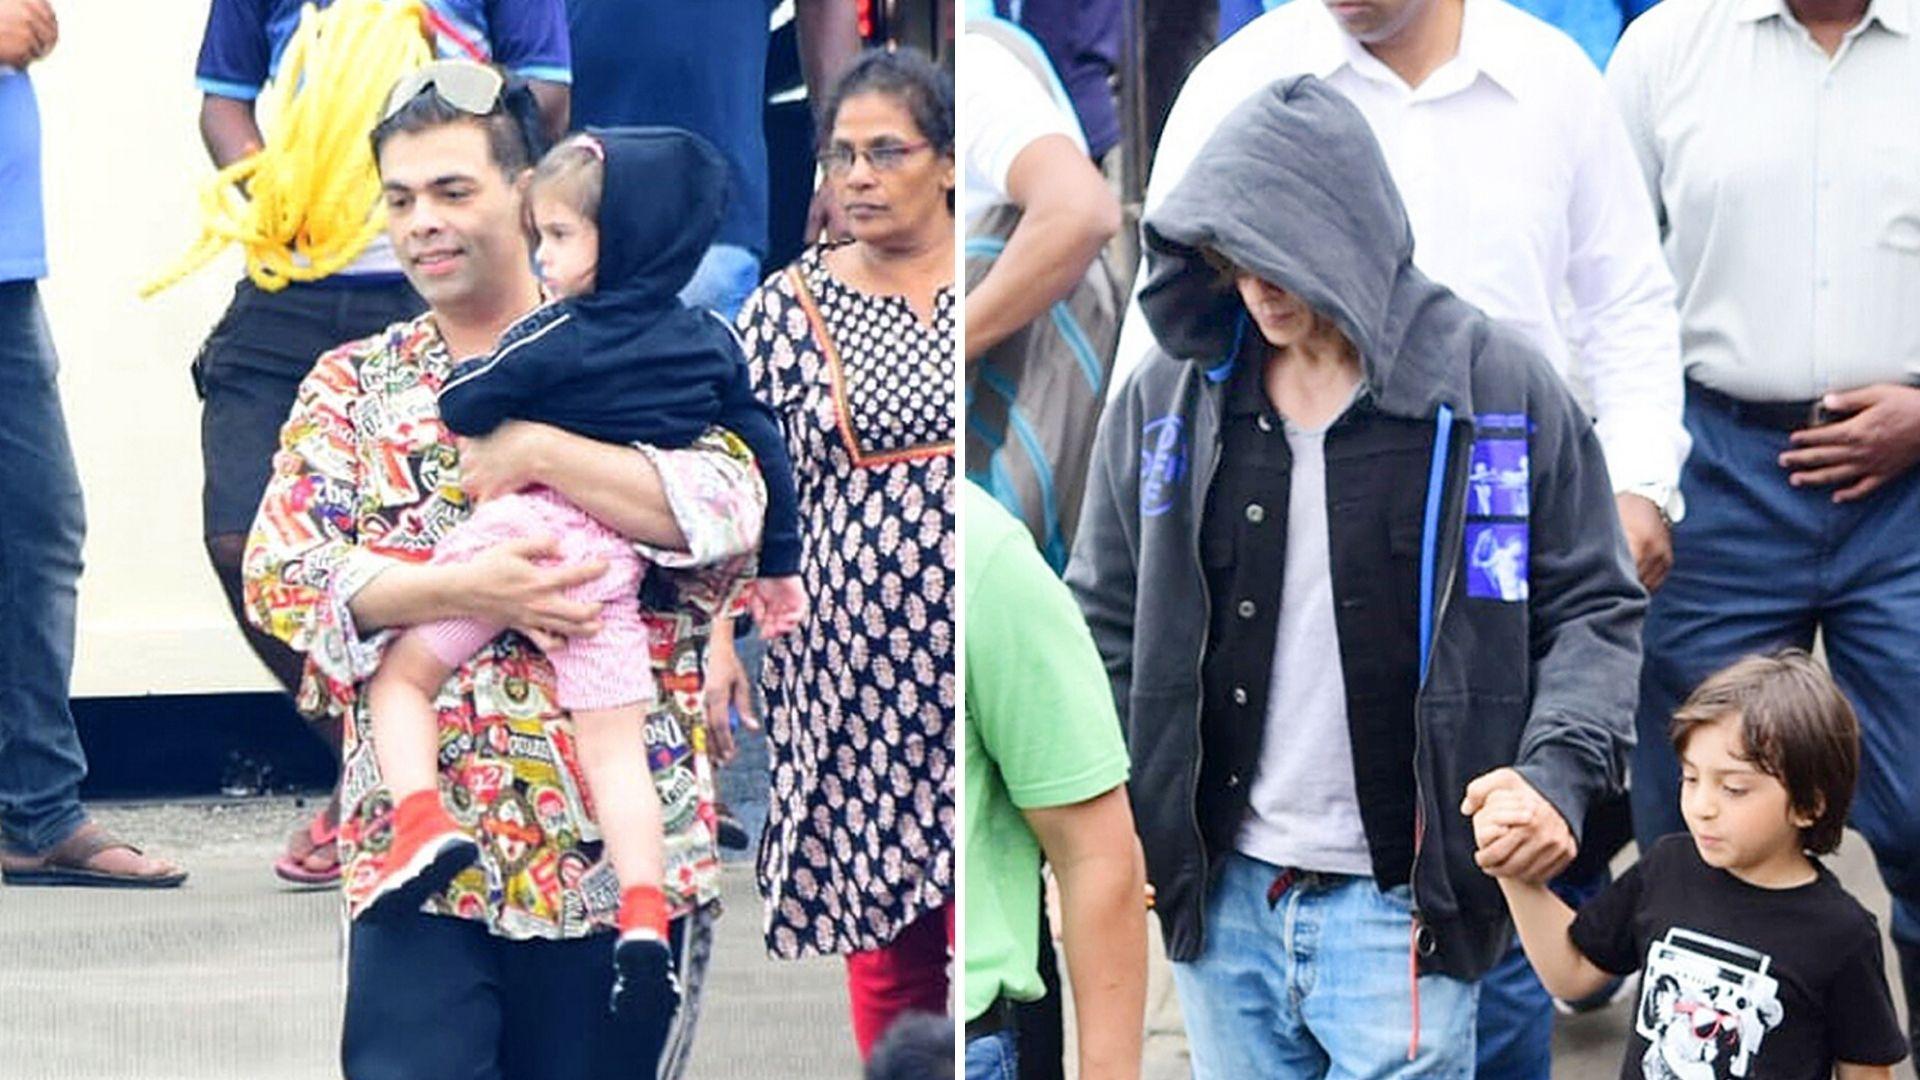 In Pics: SRK, Gauri, KJo Depart From Gateway of India